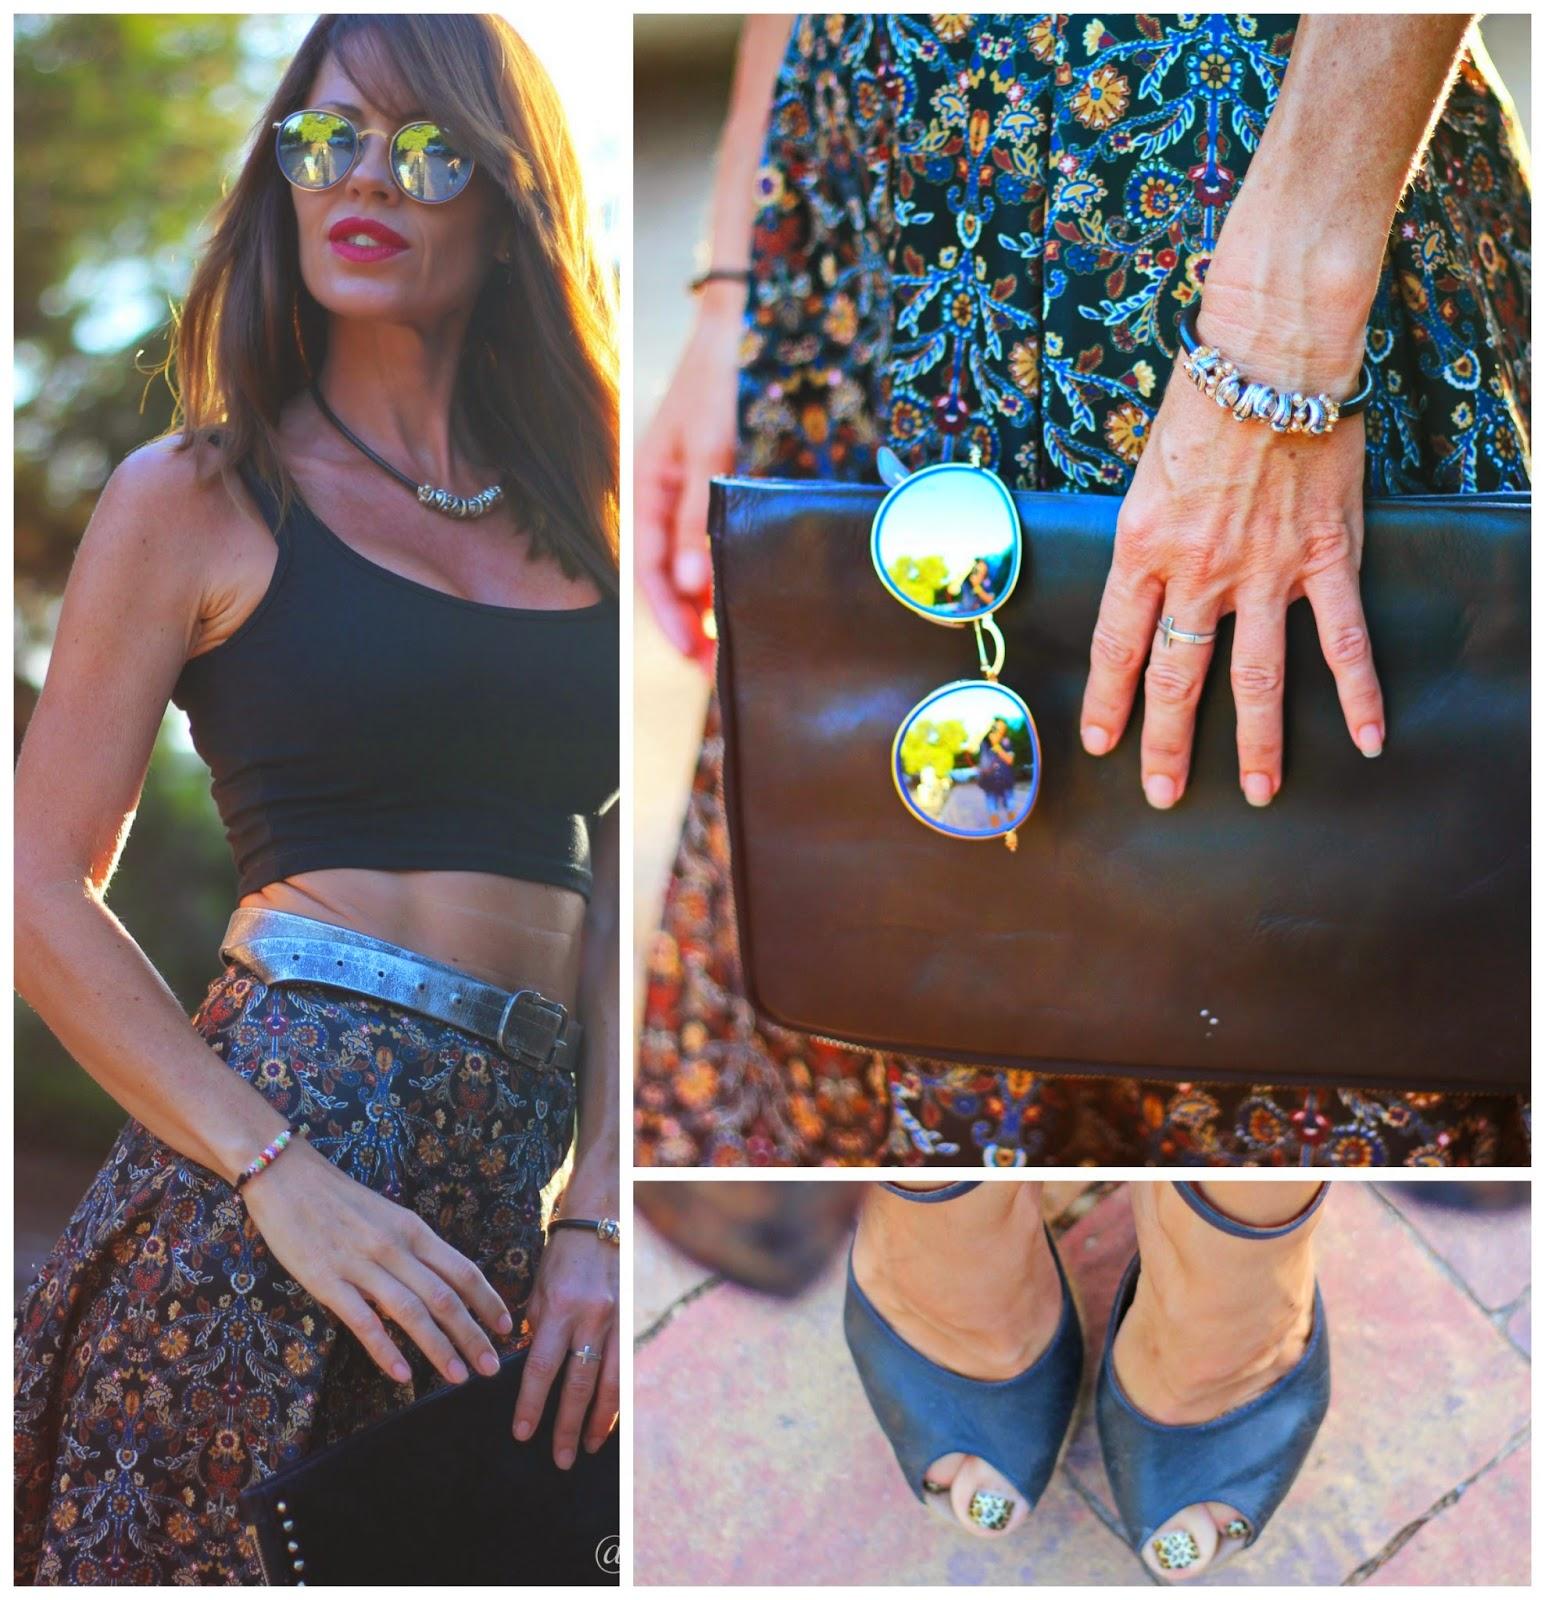 tendencias 2014 - looks septiembre - falda midi - gafas rayban